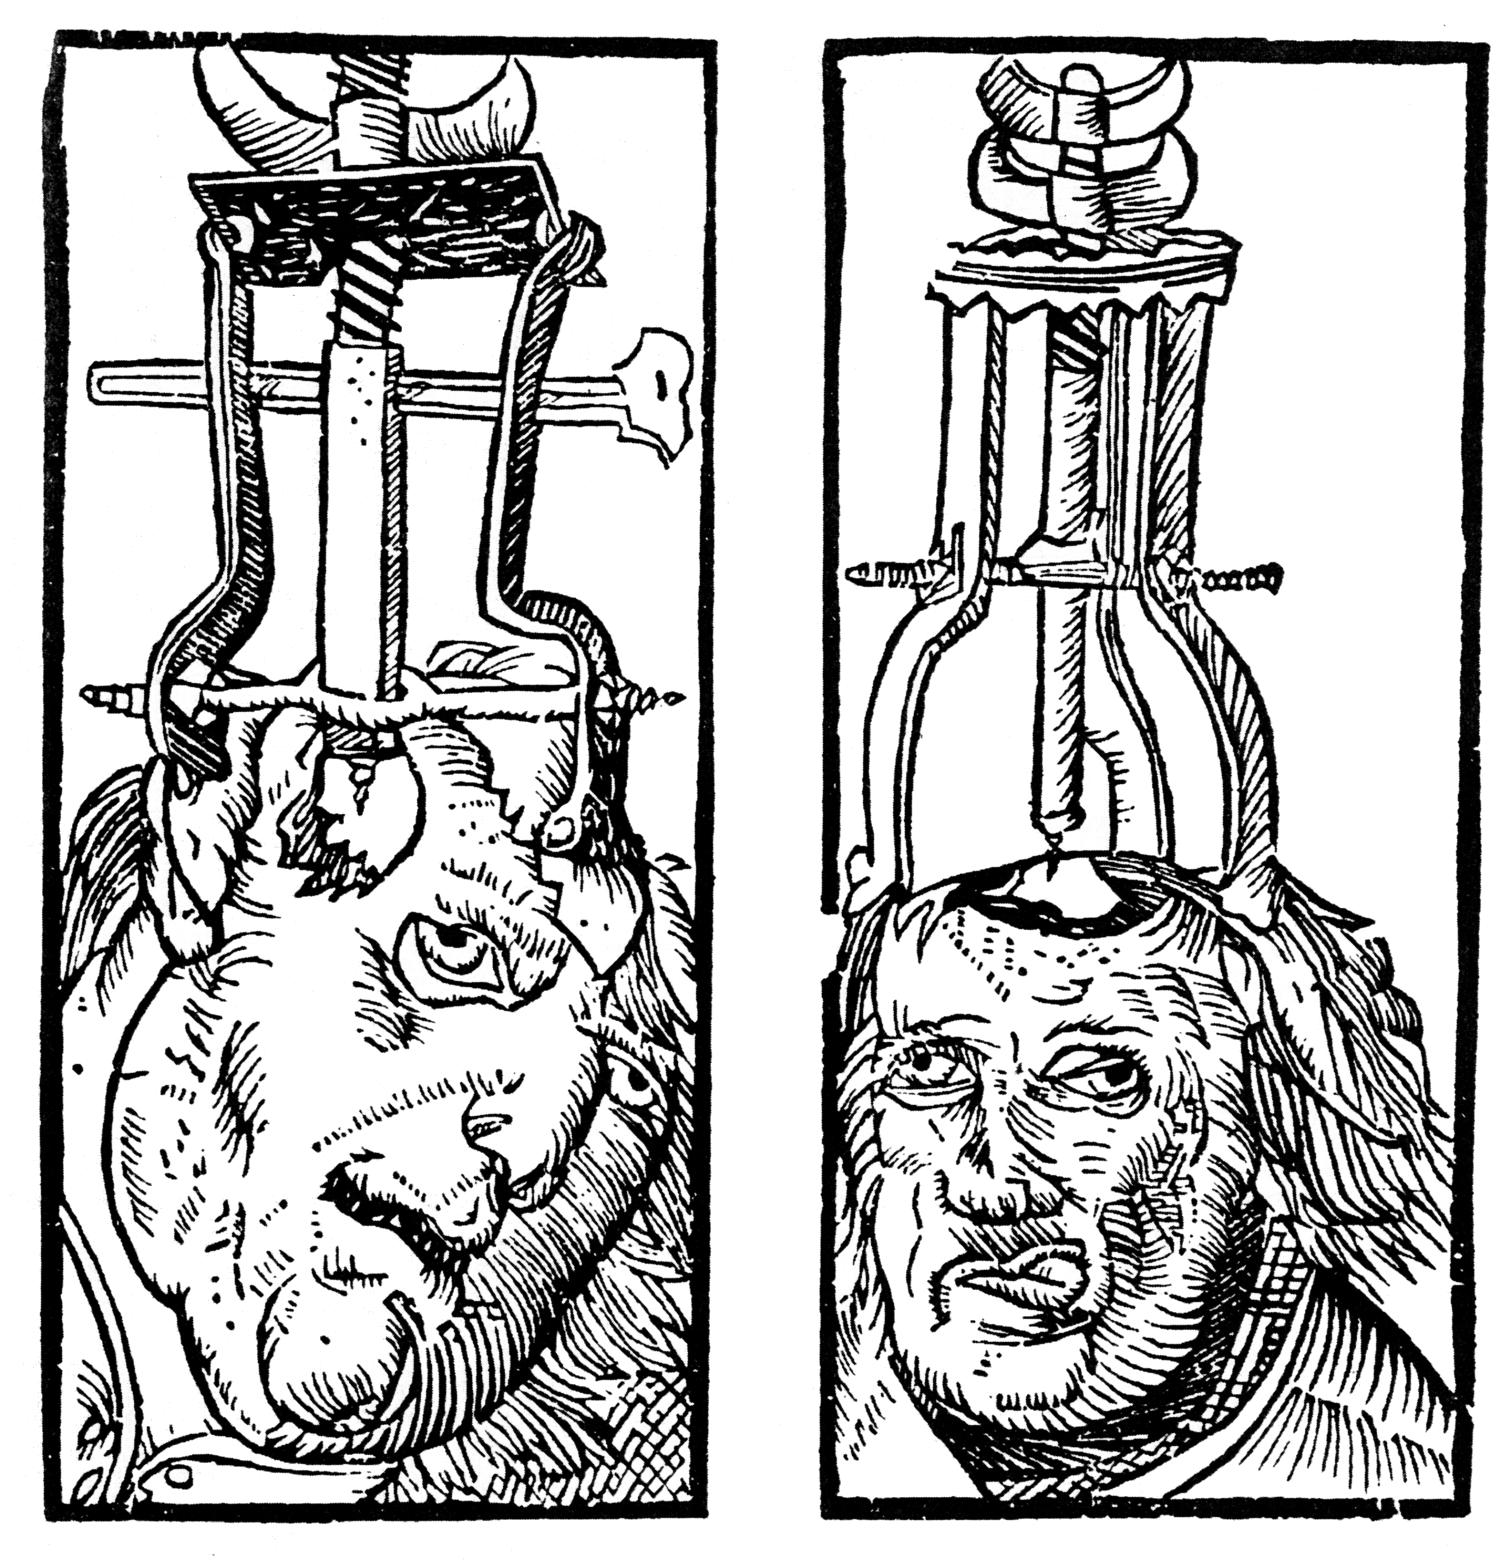 trepanation engraving ancient medical practice